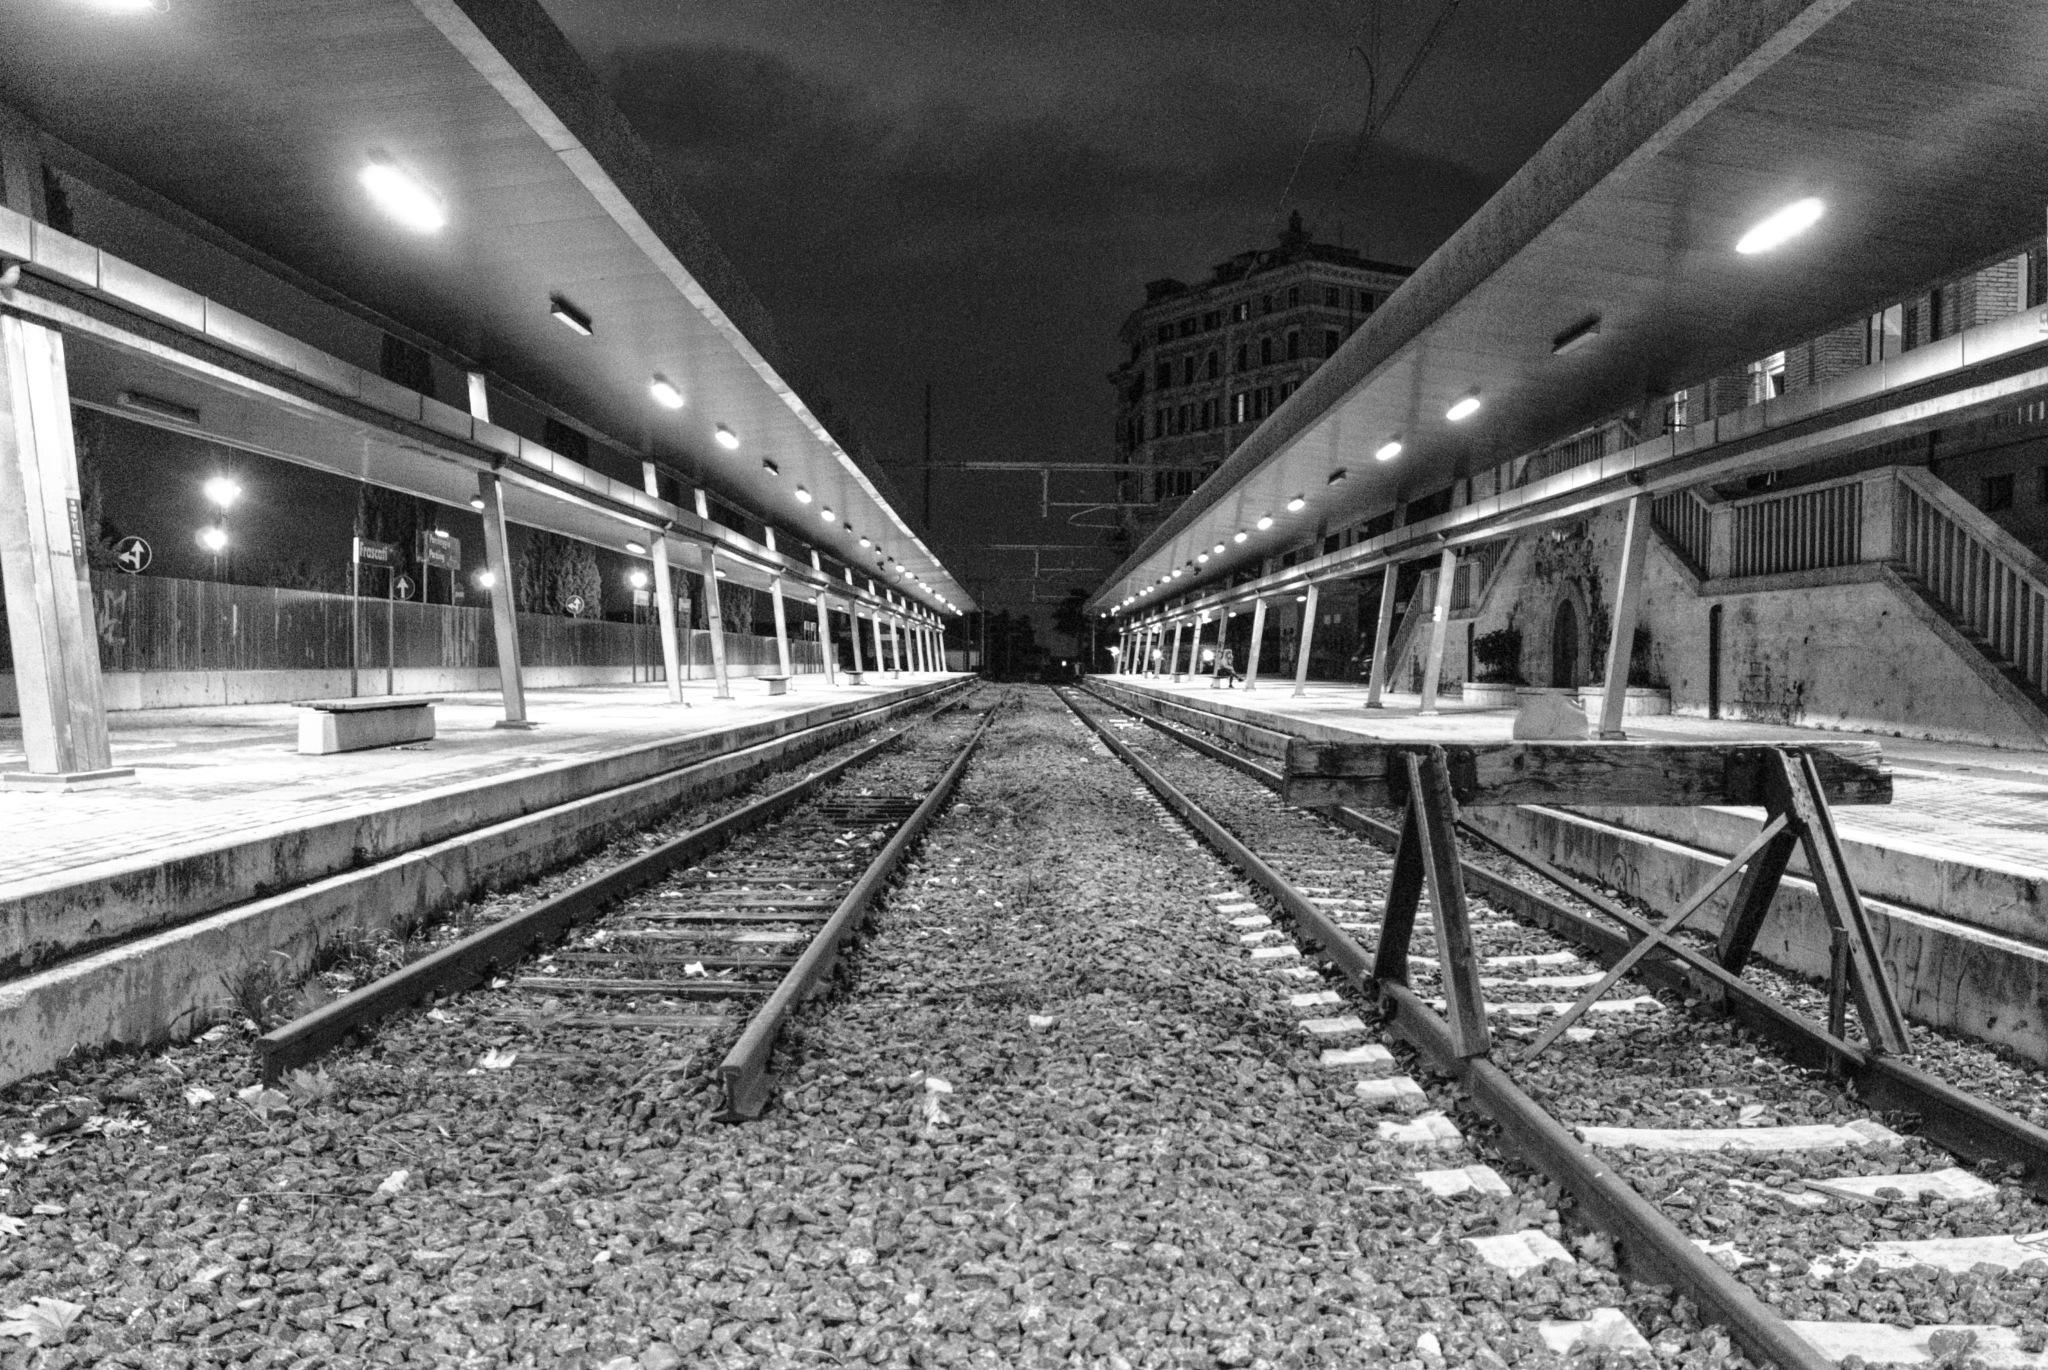 Train station Frascati by Roberto Mandolini